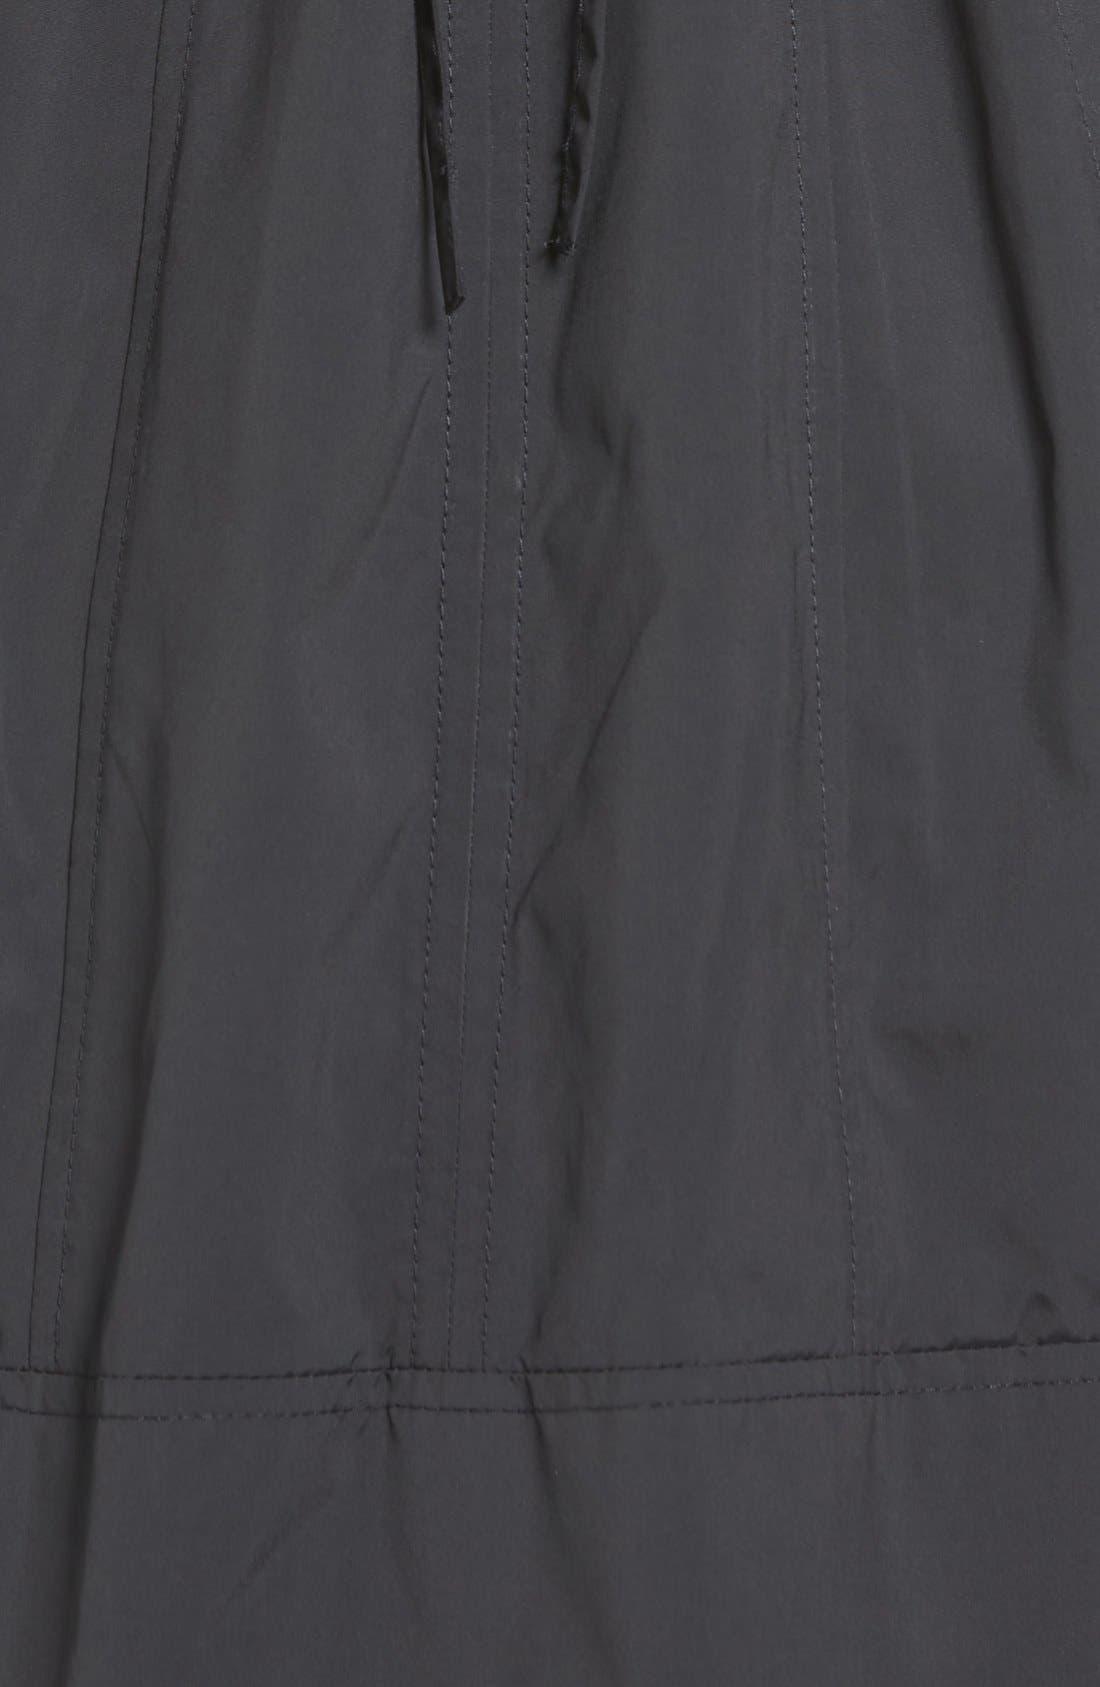 COLE HAAN SIGNATURE, Back Bow Packable Hooded Raincoat, Alternate thumbnail 7, color, BLACK